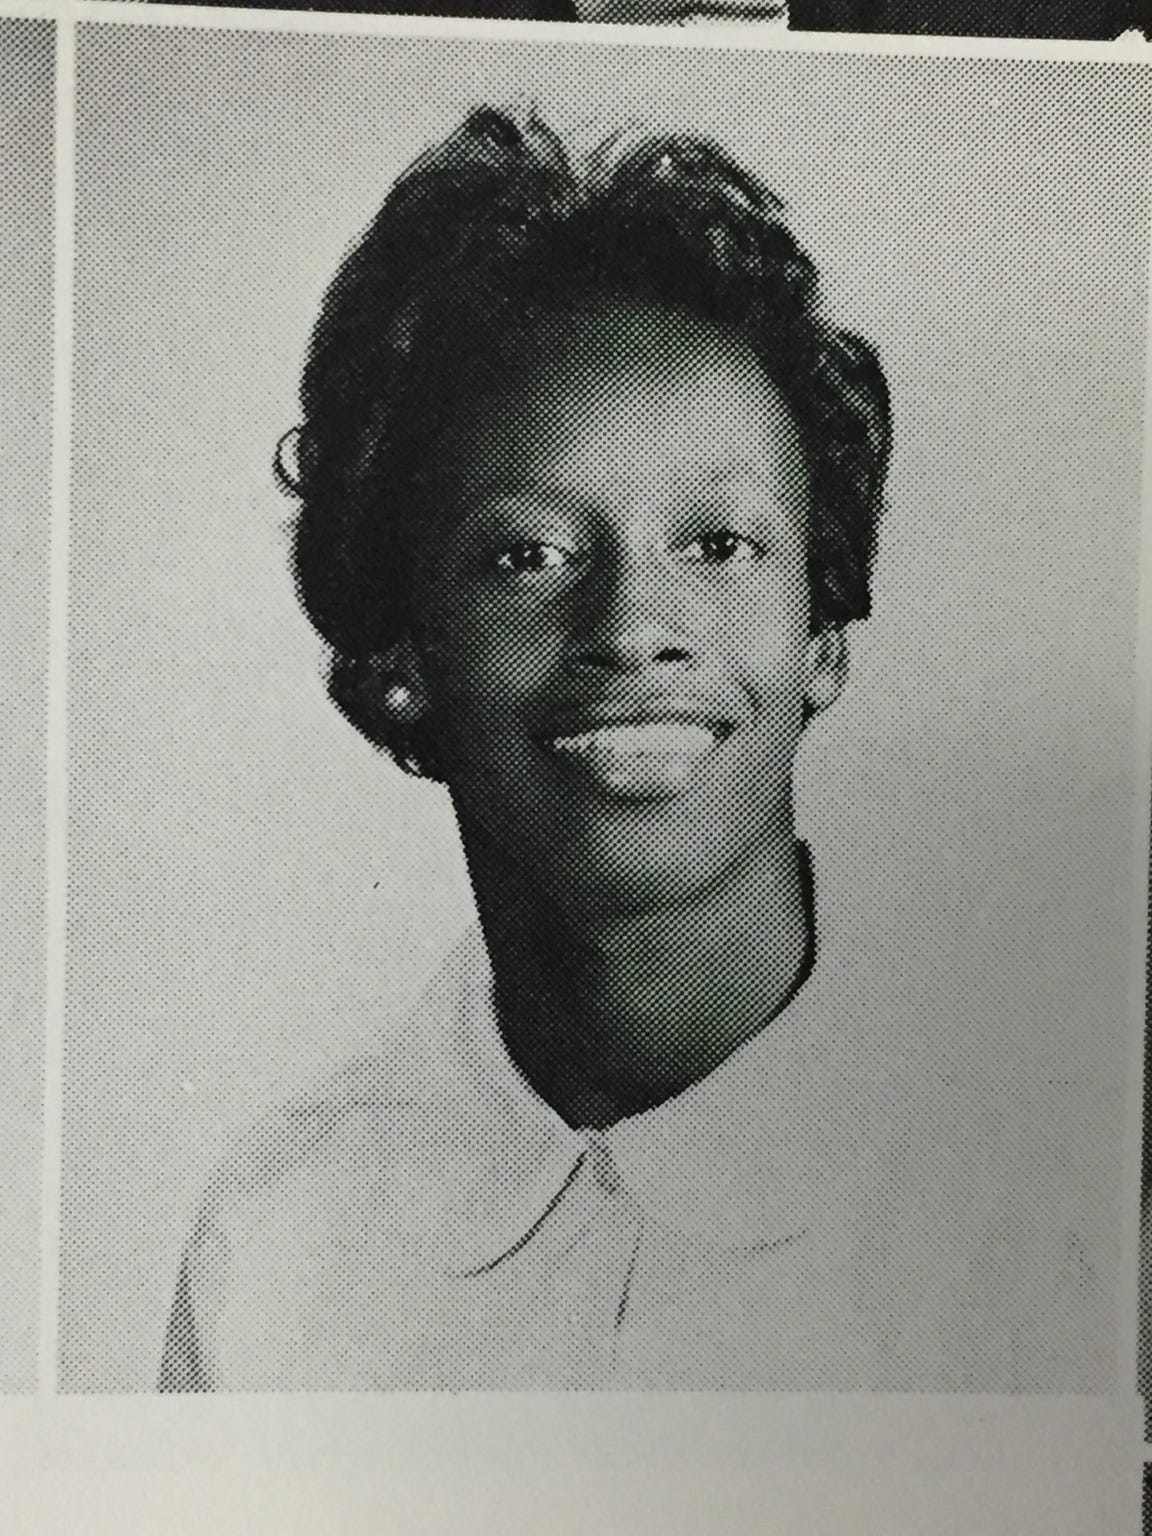 Triggs-Mercer's high school photo